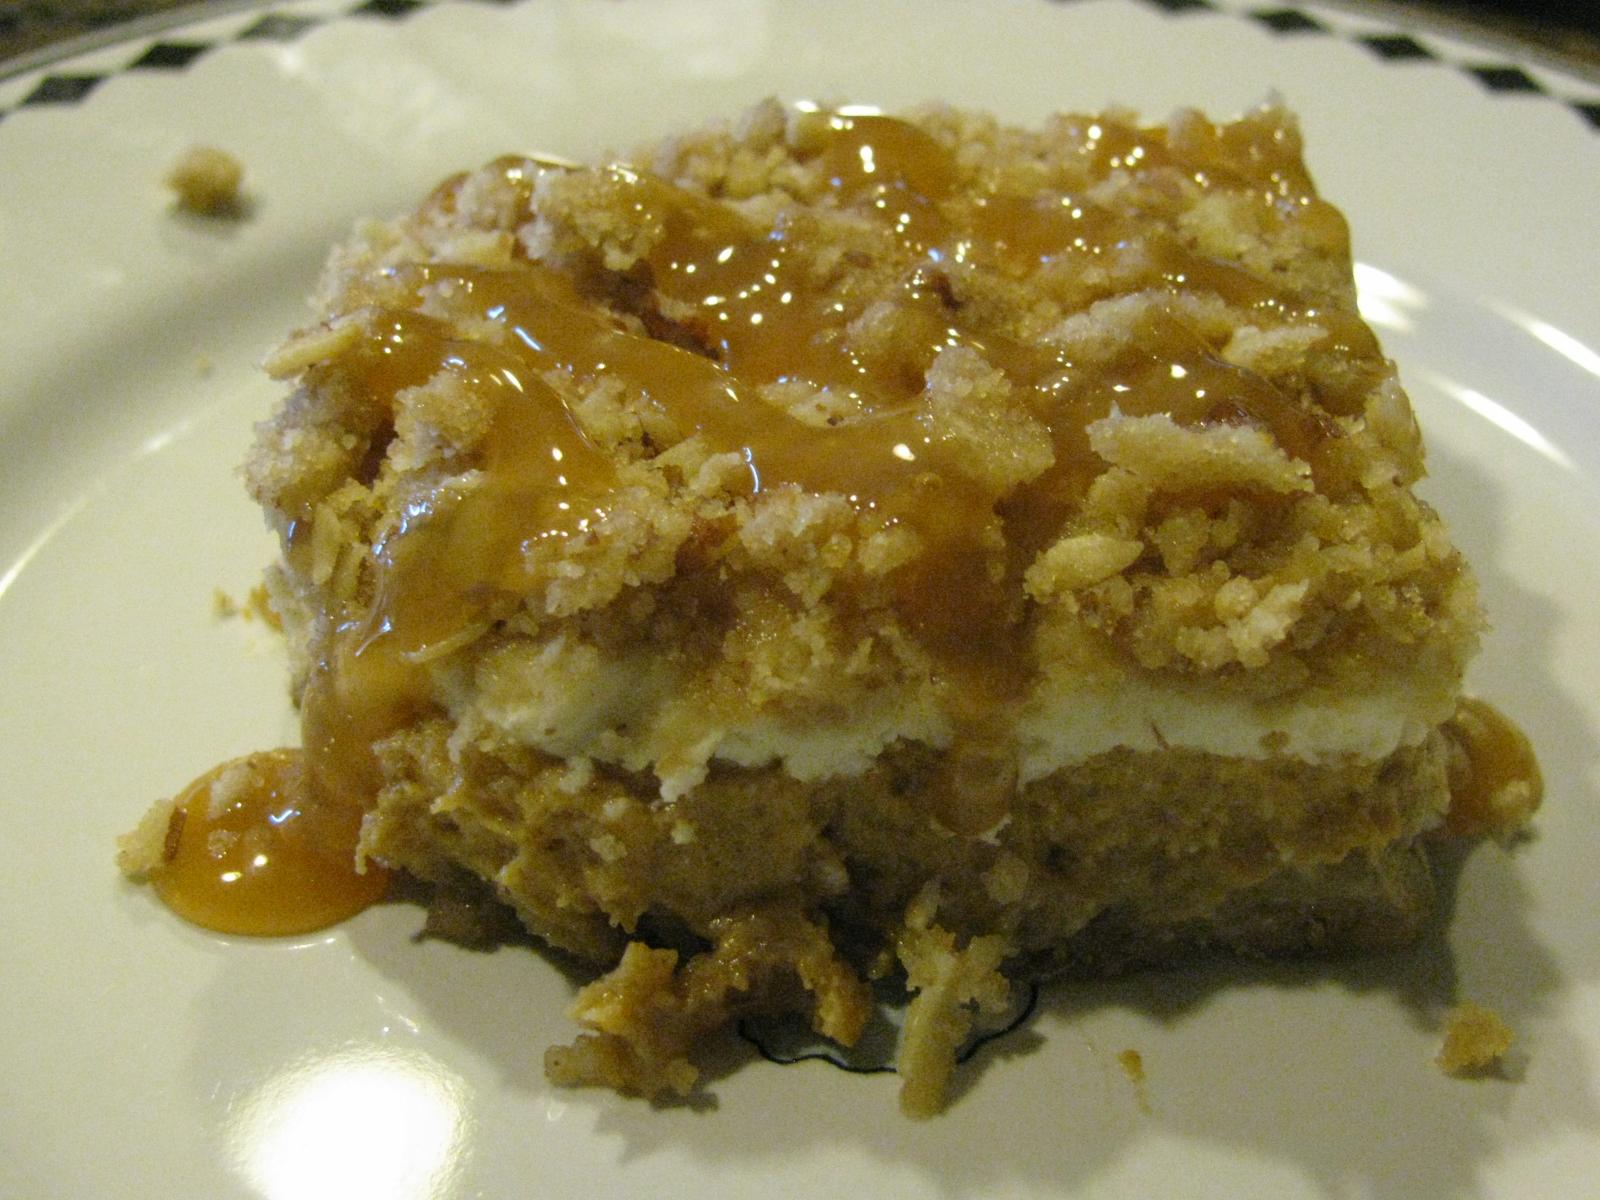 Anissa's Kitchen: Pumpkin Cheesecake Crumble Bars